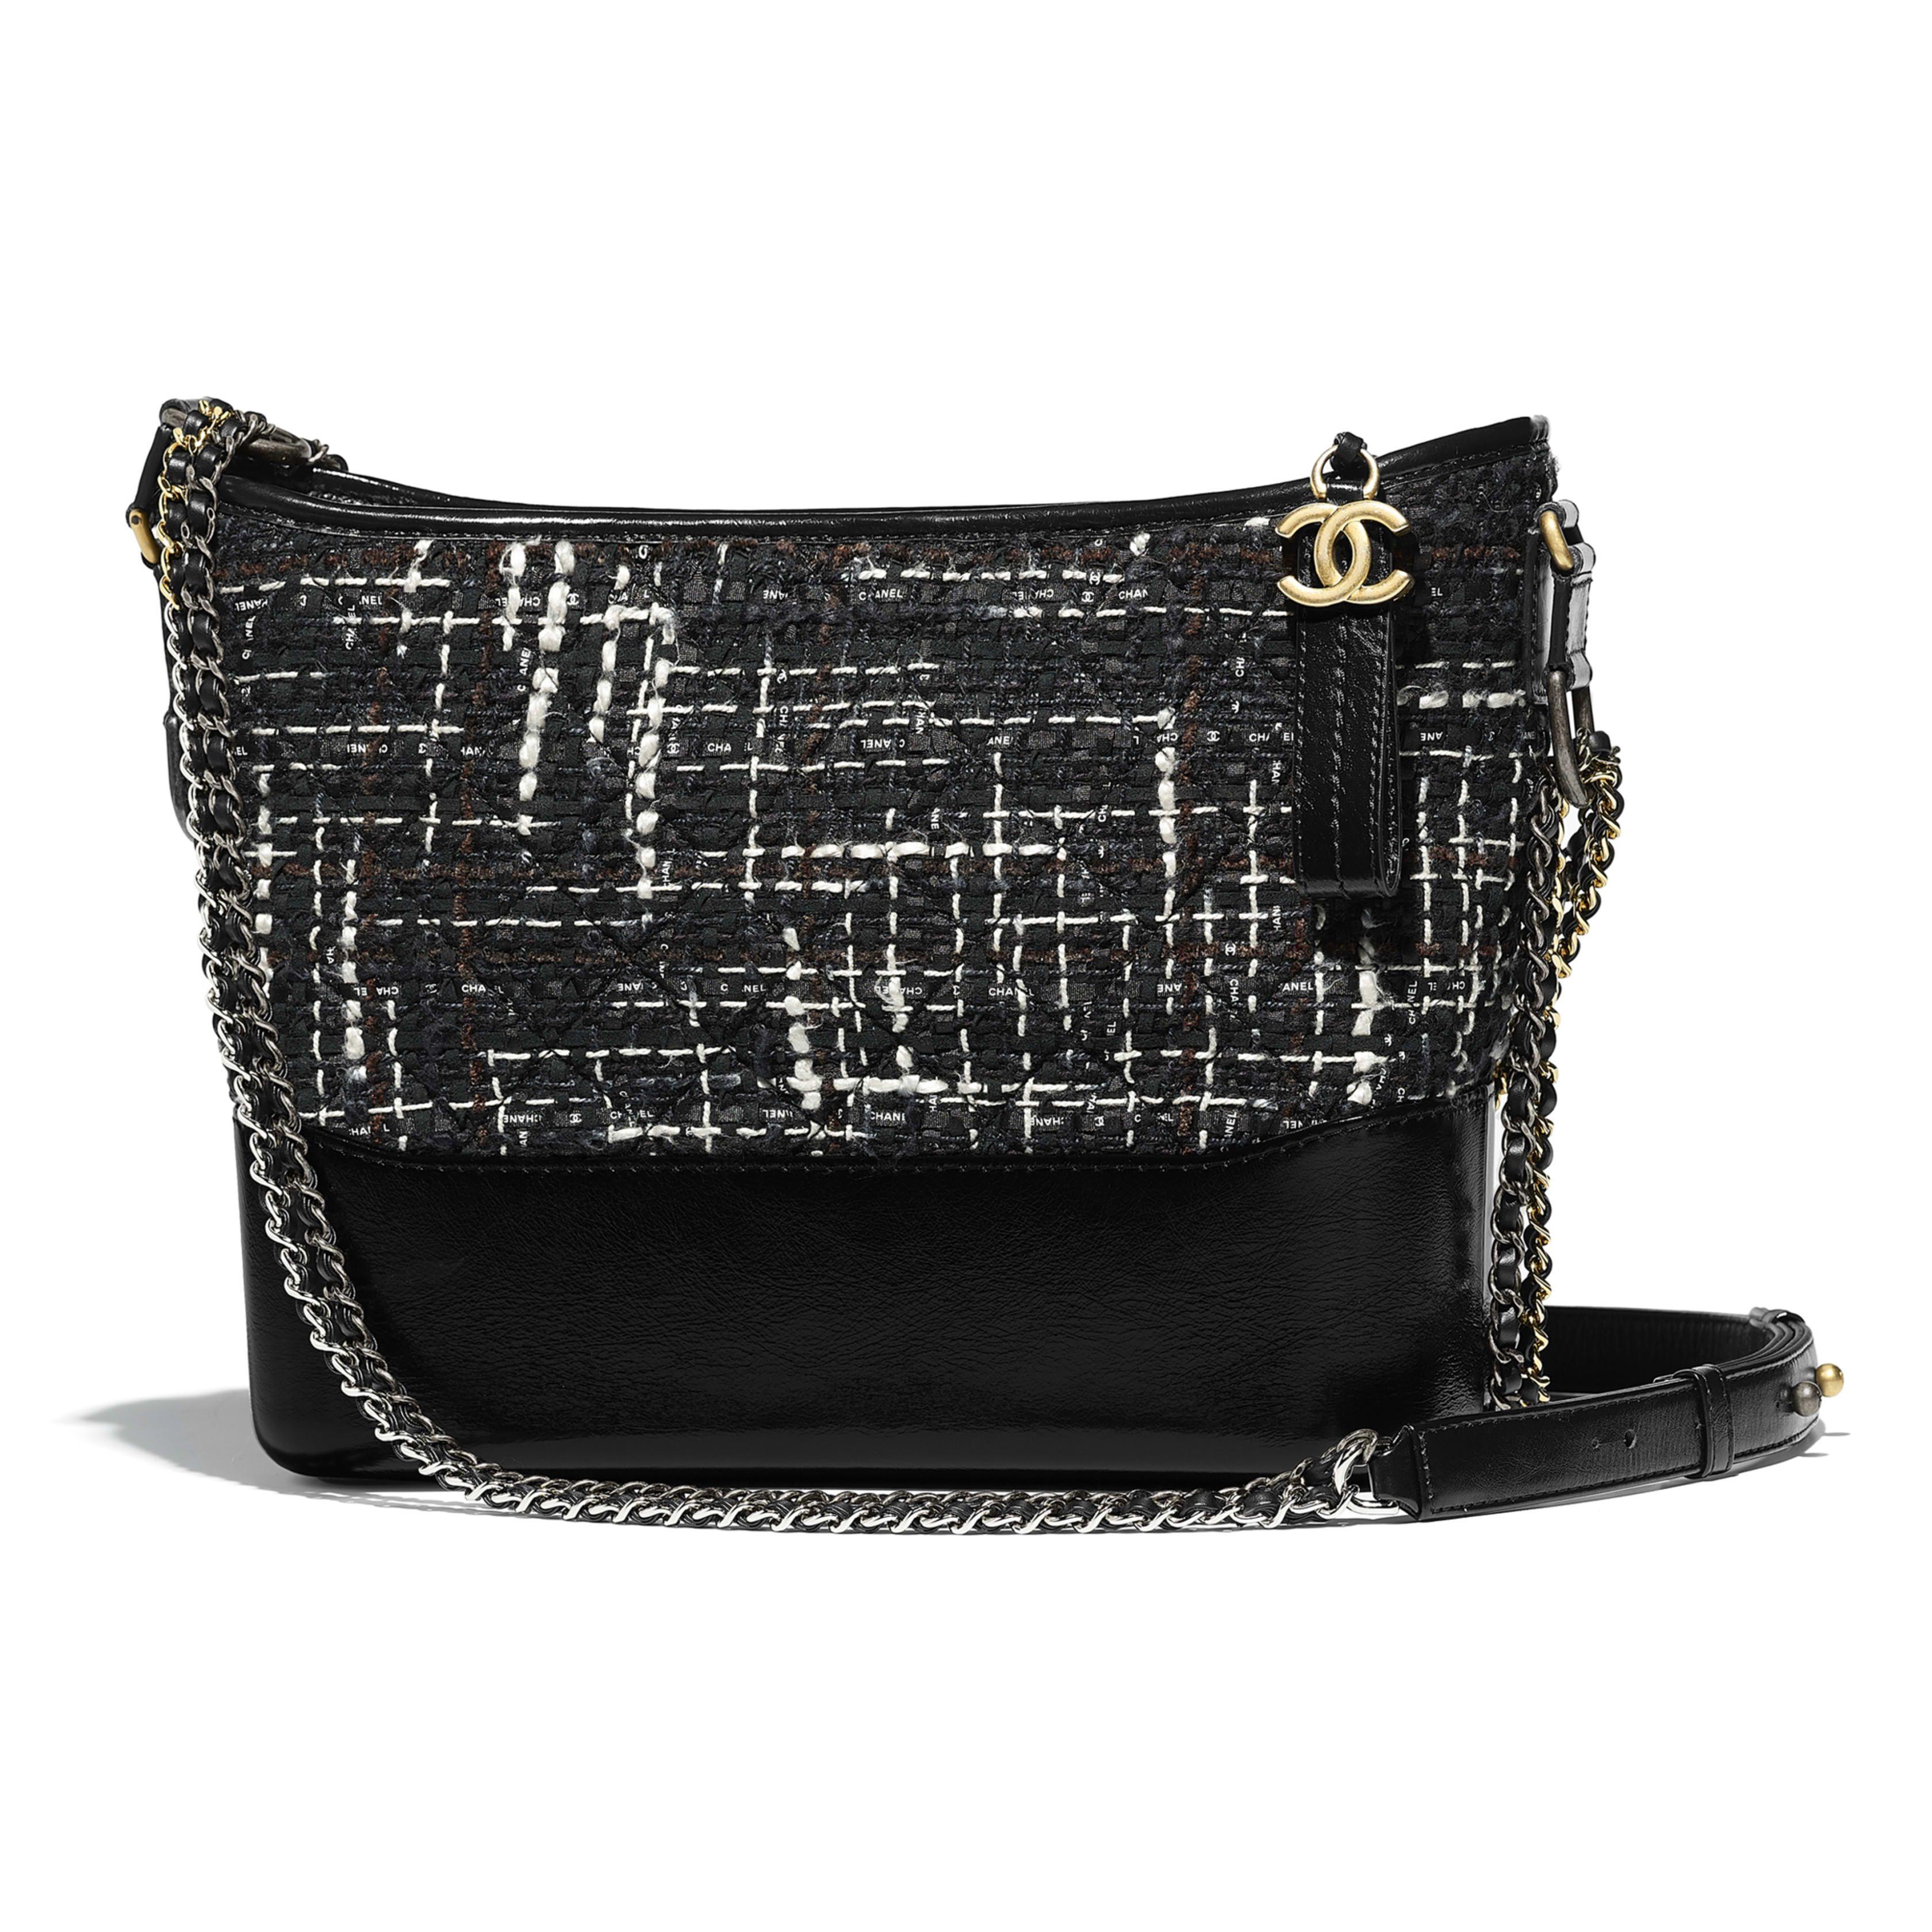 bba5c539f997fd CHANEL'S GABRIELLE Hobo Bag Tweed, Calfskin, Silver-Tone & Gold-Tone Metal  Black, Navy, Brown & Ecru $4500